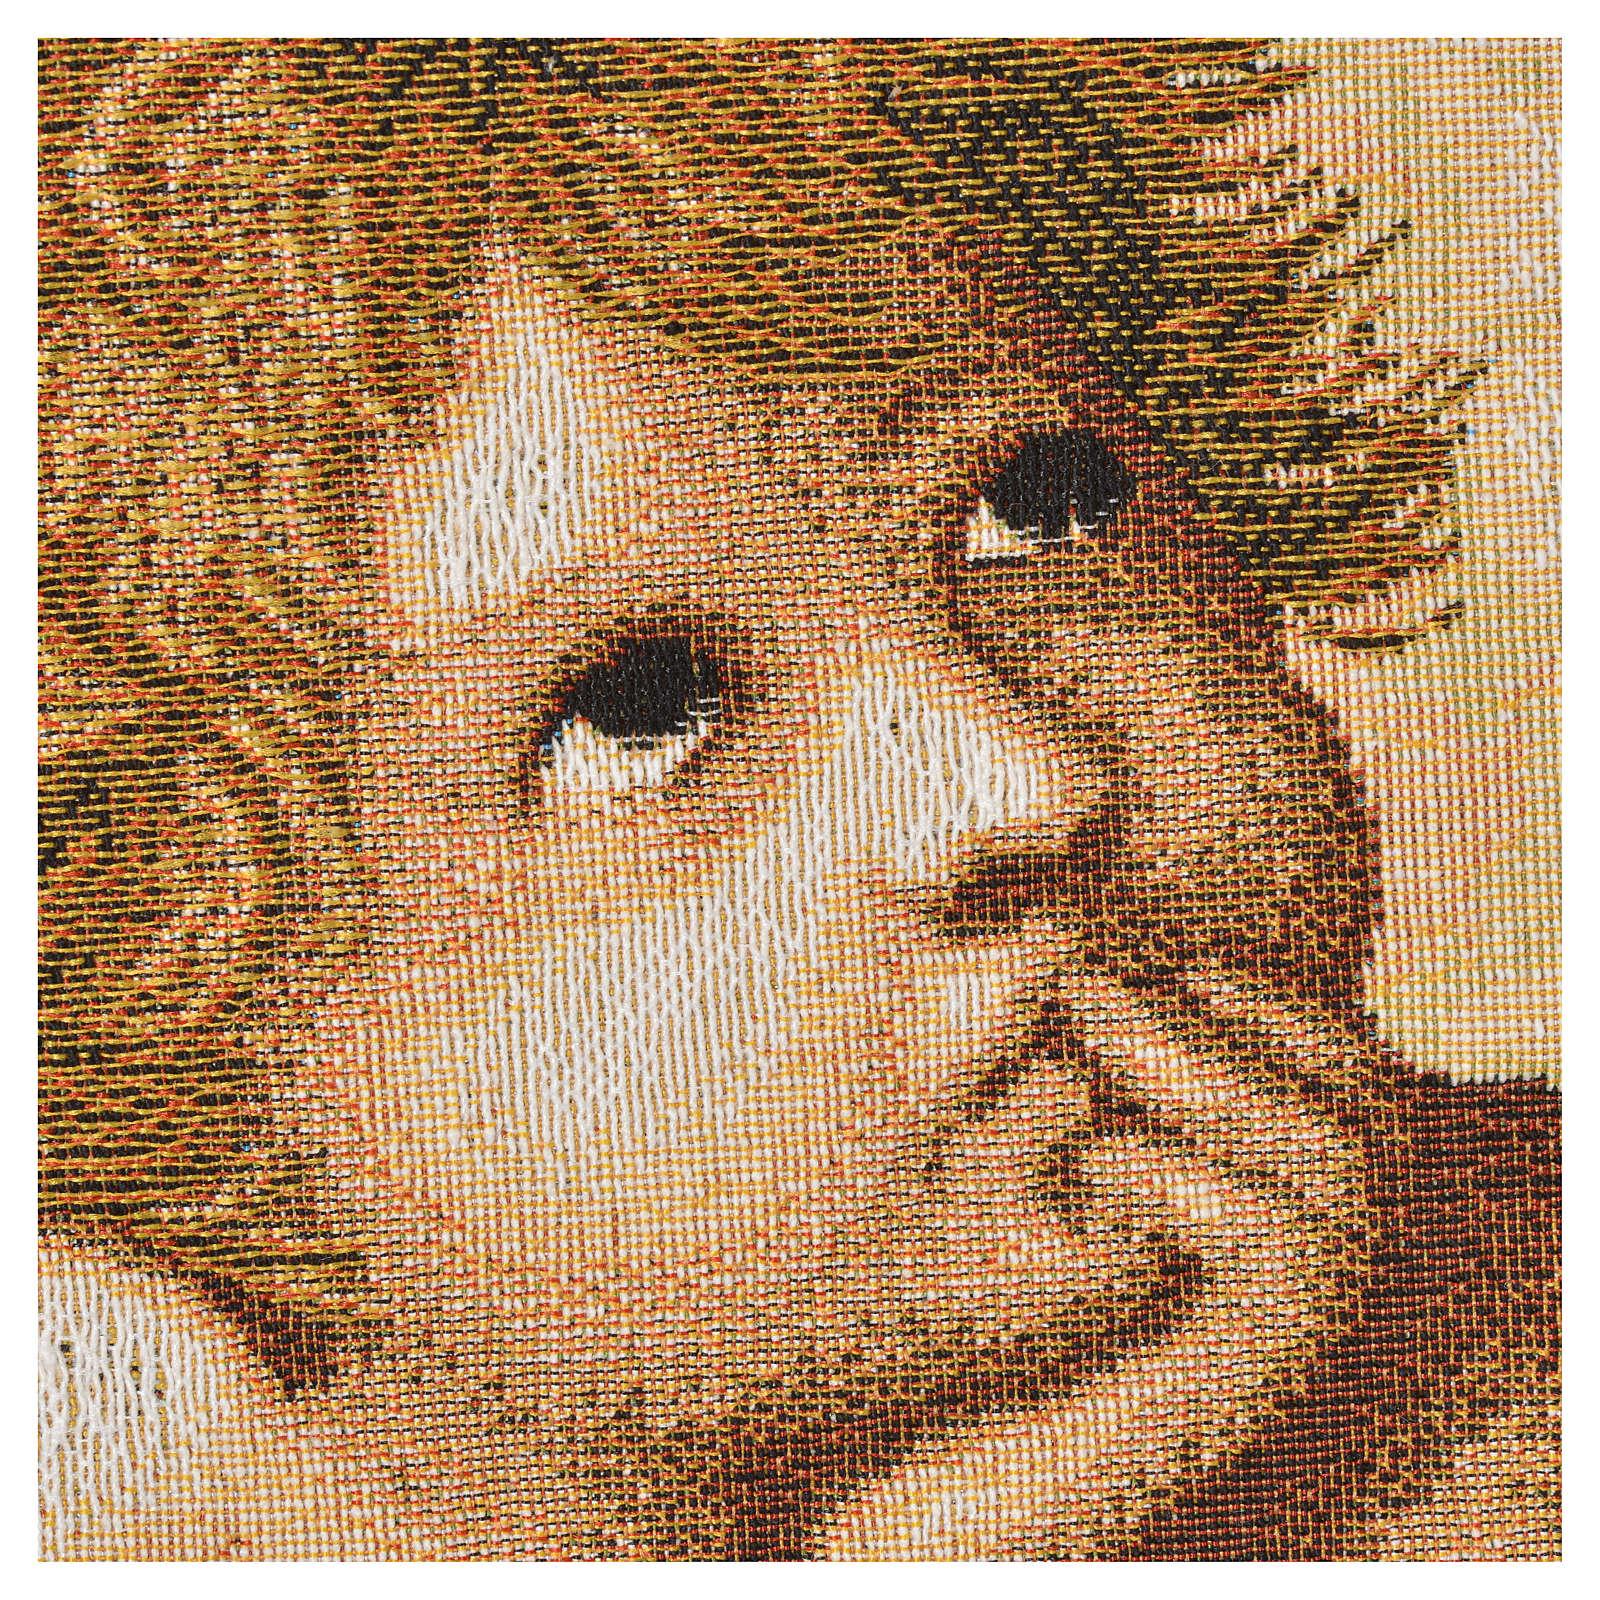 Tapestry Raphael's cherubs 50x65cm 3